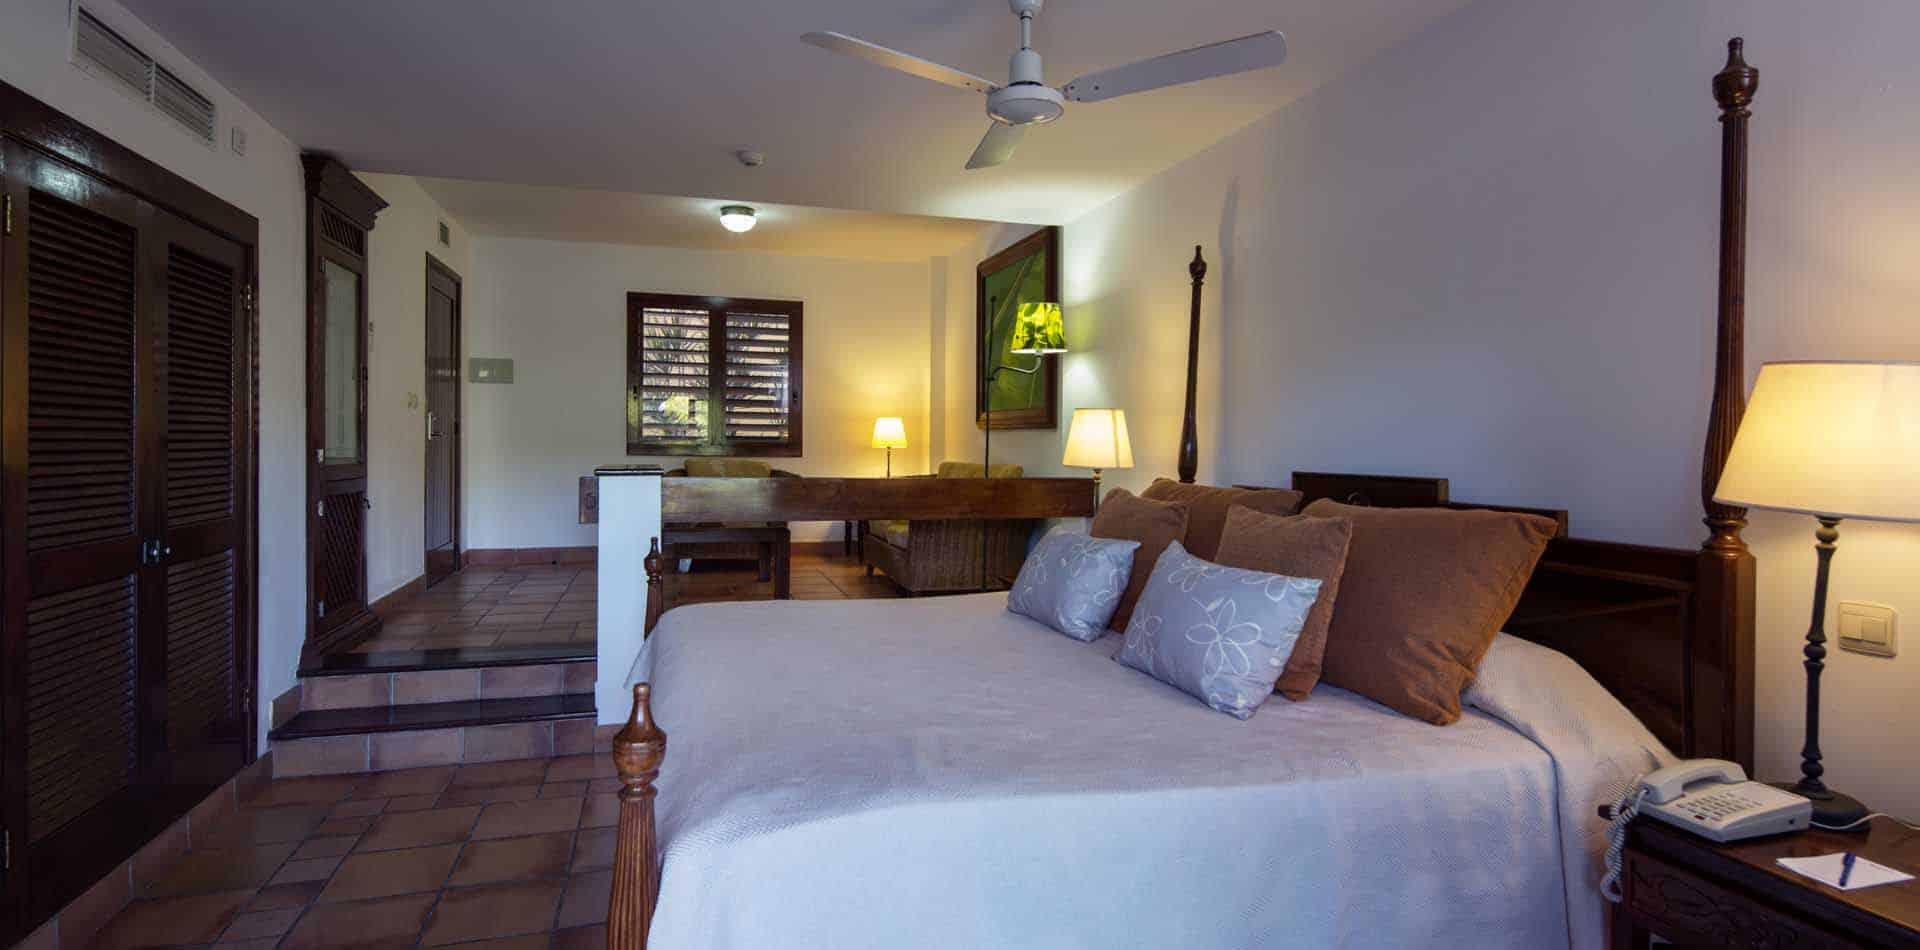 H2417 Hotel Hicacos Varadero 01 cuba autrement